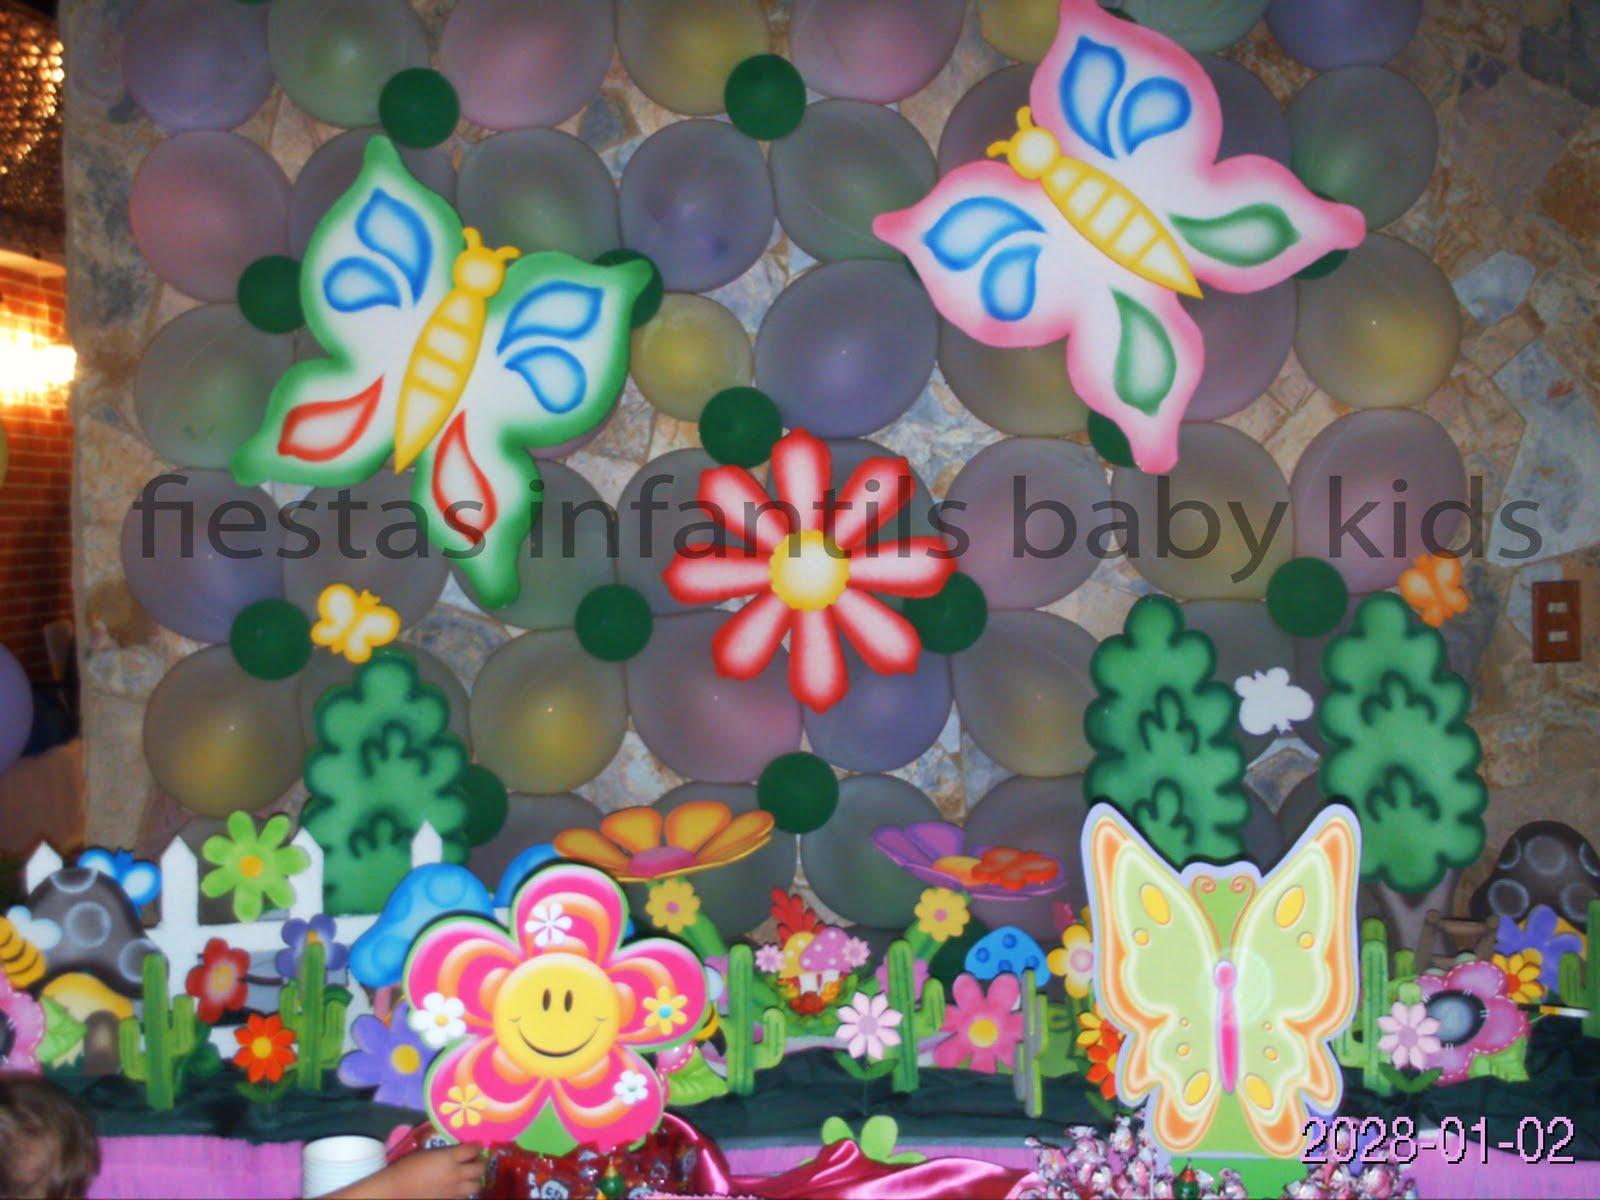 Fiestas infantiles baby kids decoracion de mariposa jardin for Decoracion verano para jardin infantil